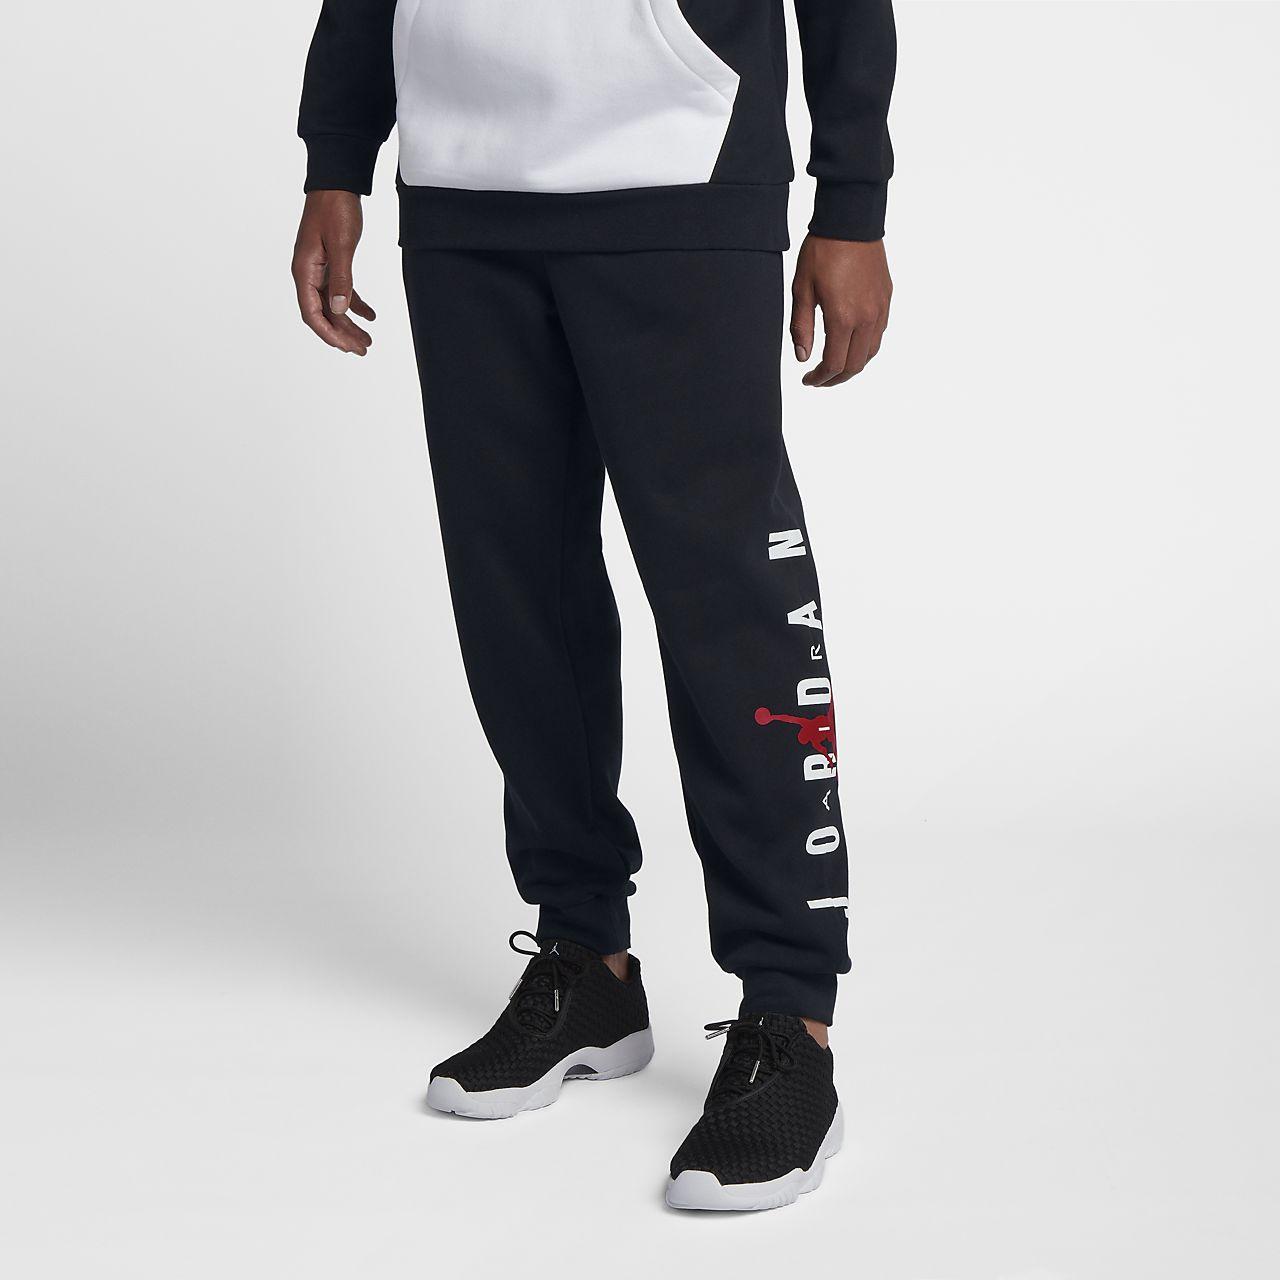 9d88fa6c8e4 Jordan Jumpman Air Men's Fleece Pants. Nike.com